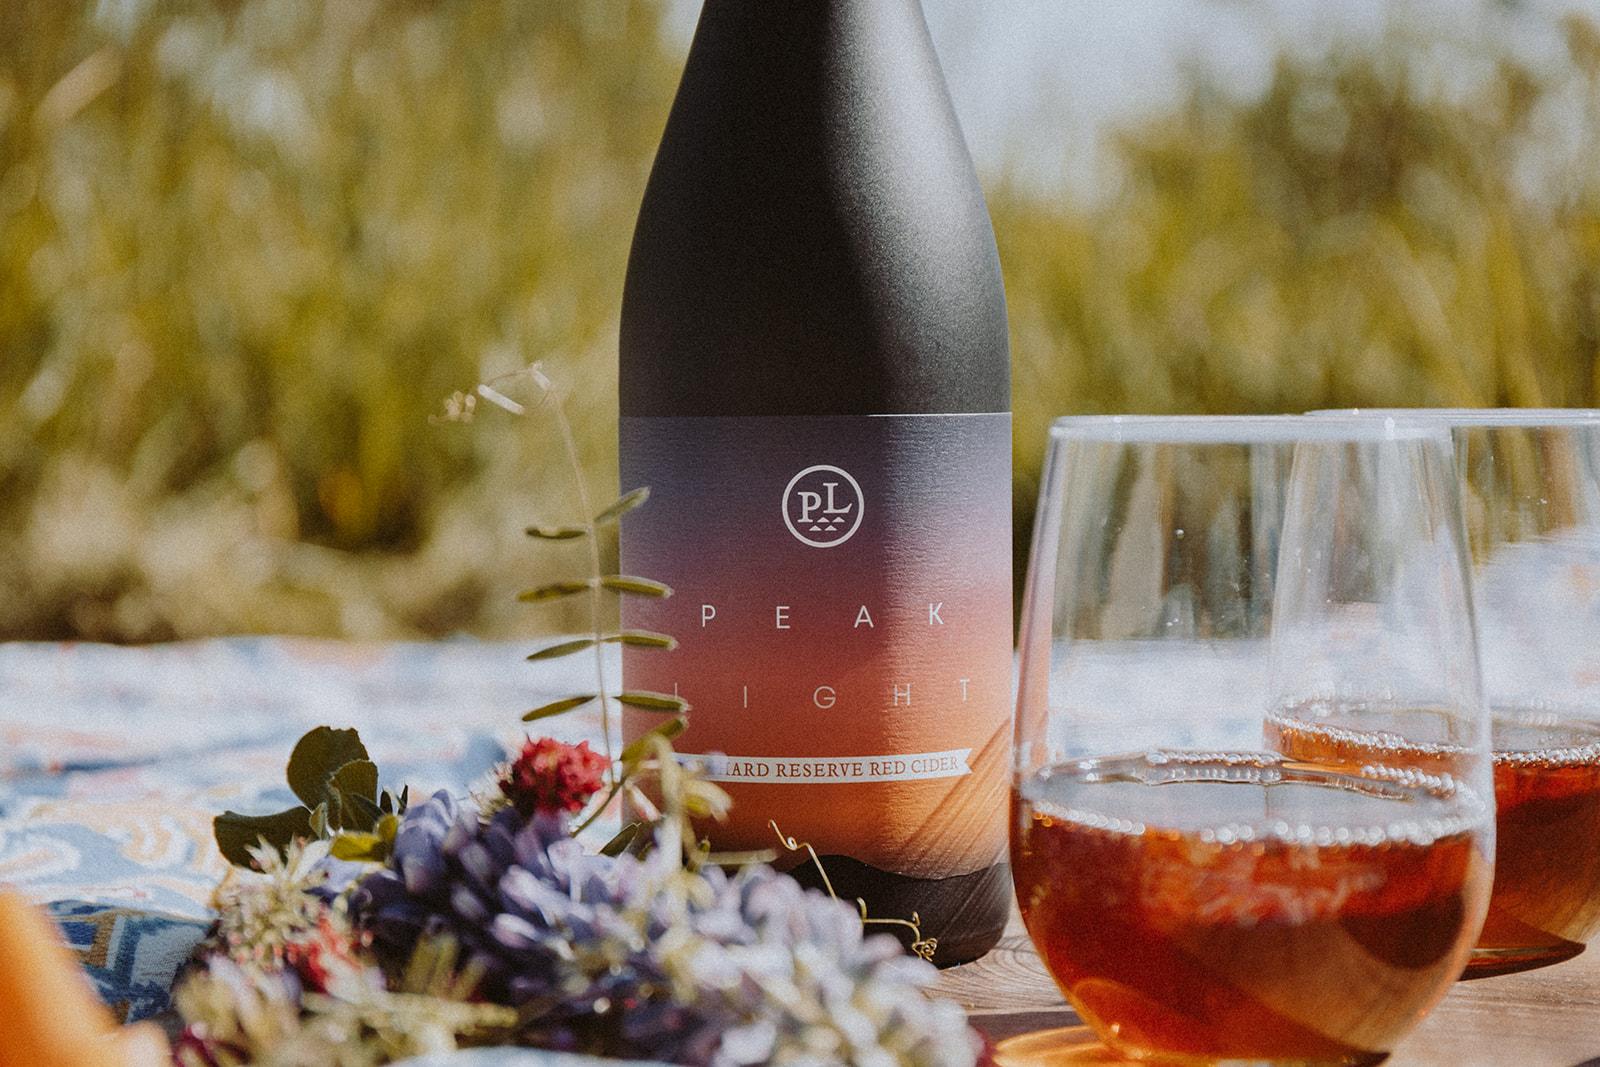 image courtesy of Peak Light Cider